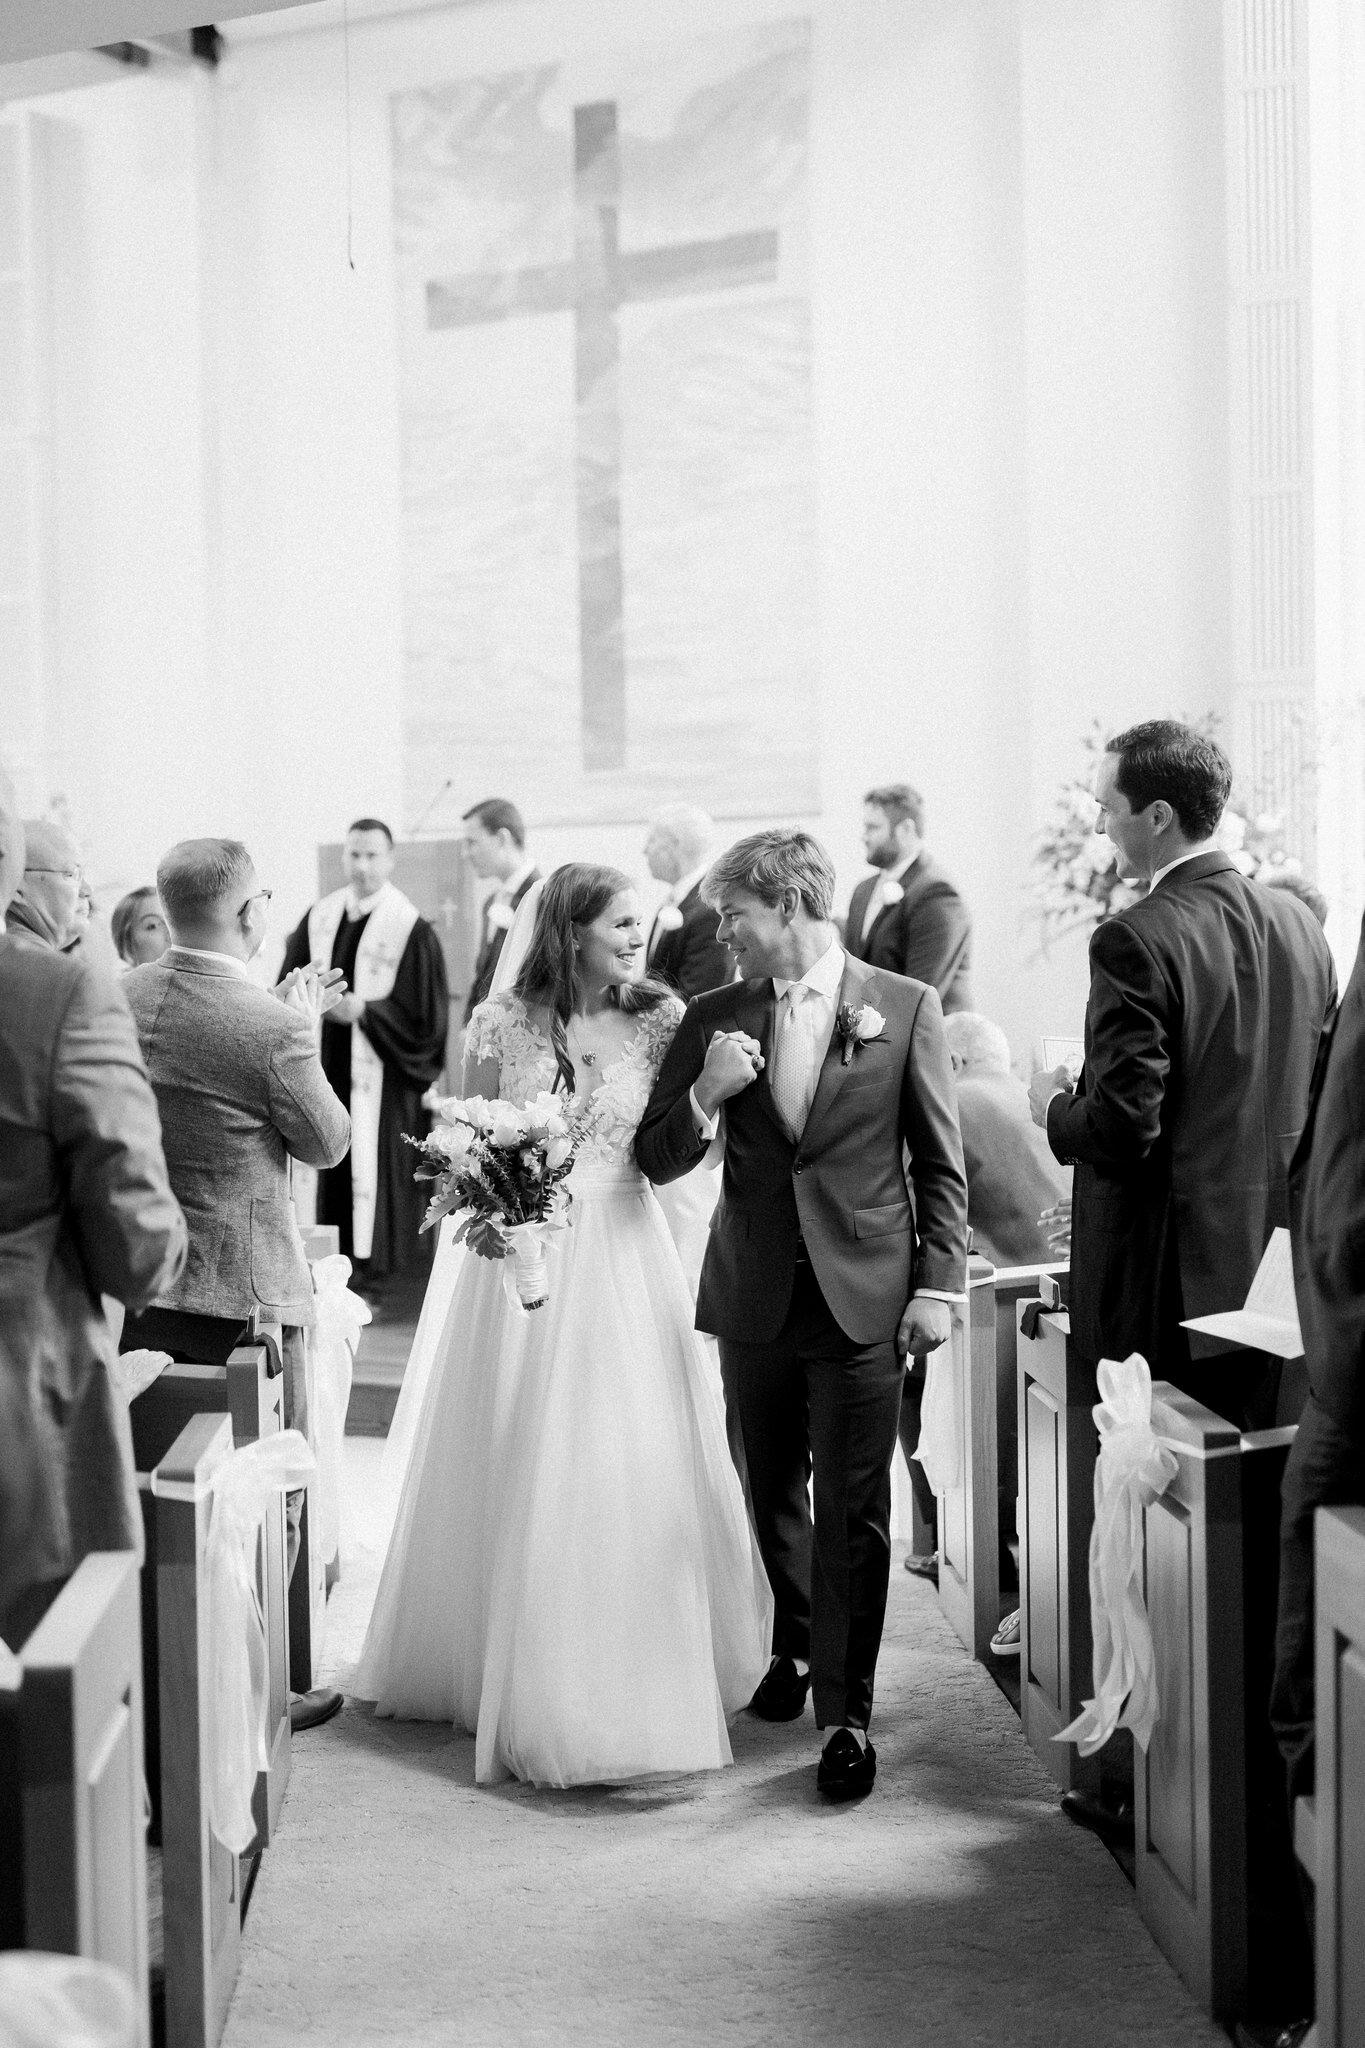 greenwich wedding_belle haven club wedding _ct wedding photographer-26_Easy-Resize.com.jpg